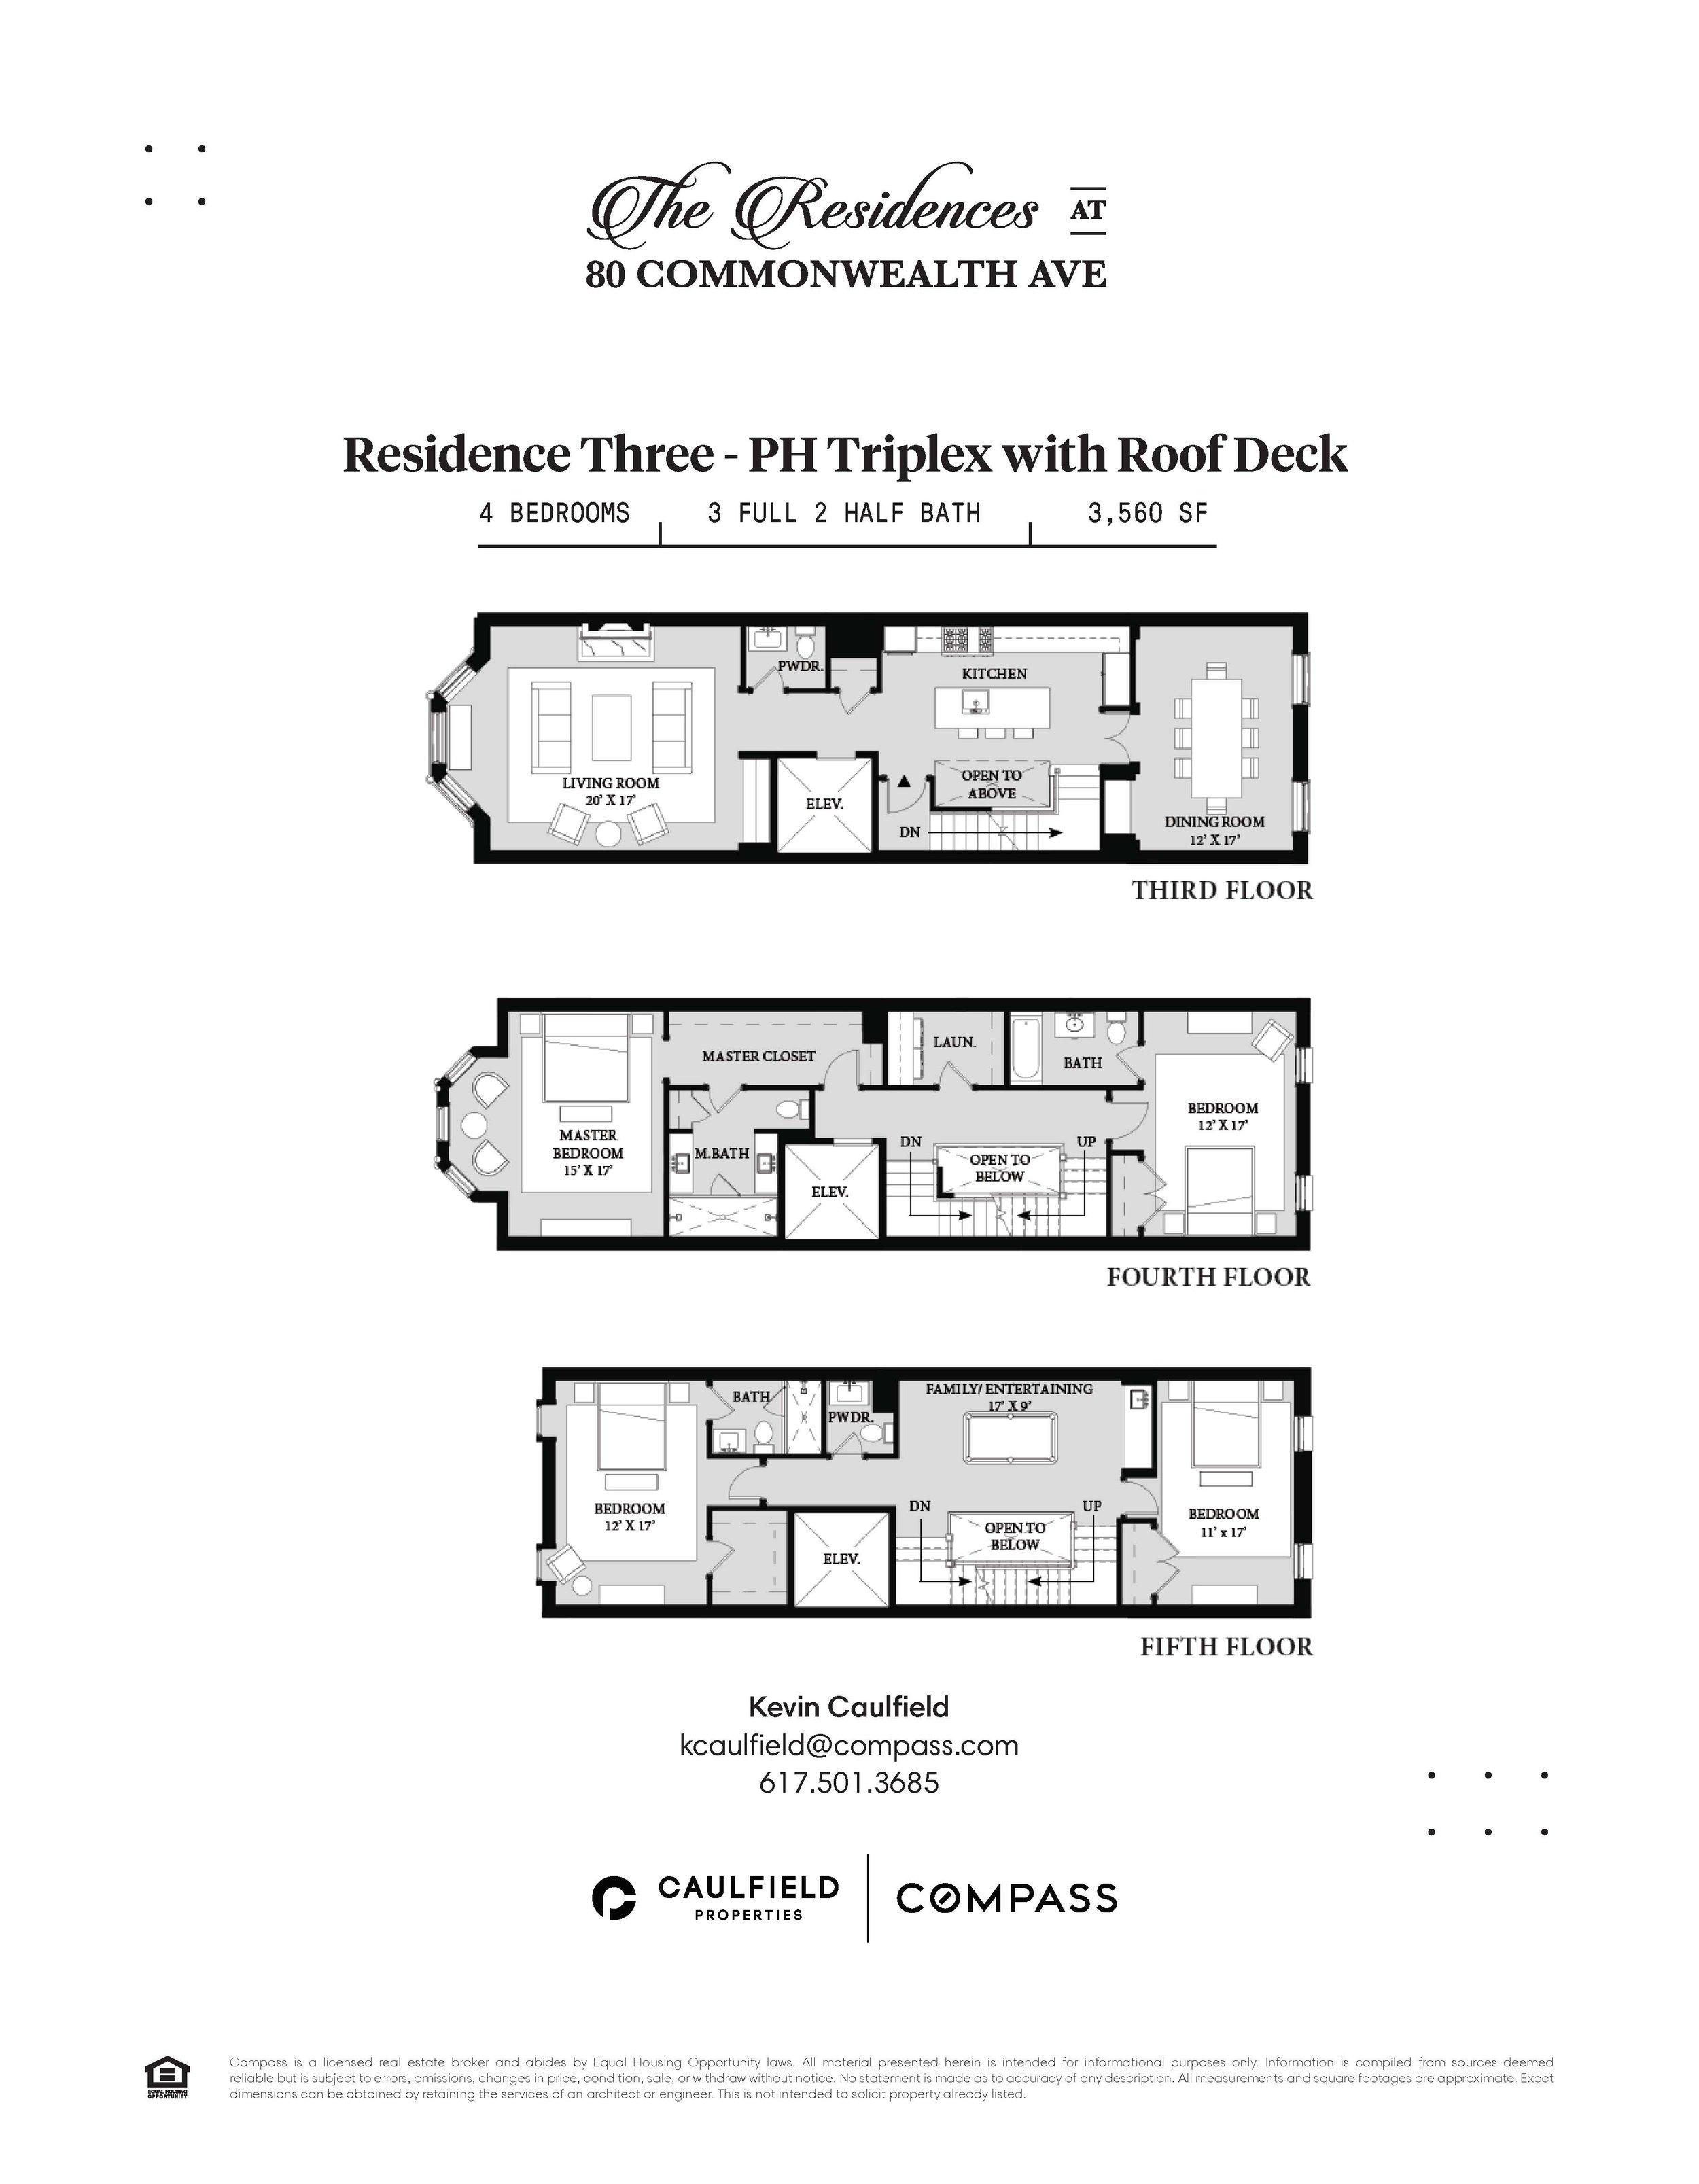 Caulfield Properties--80 Comm Ave Floor Plan Inserts_Final_03.jpg